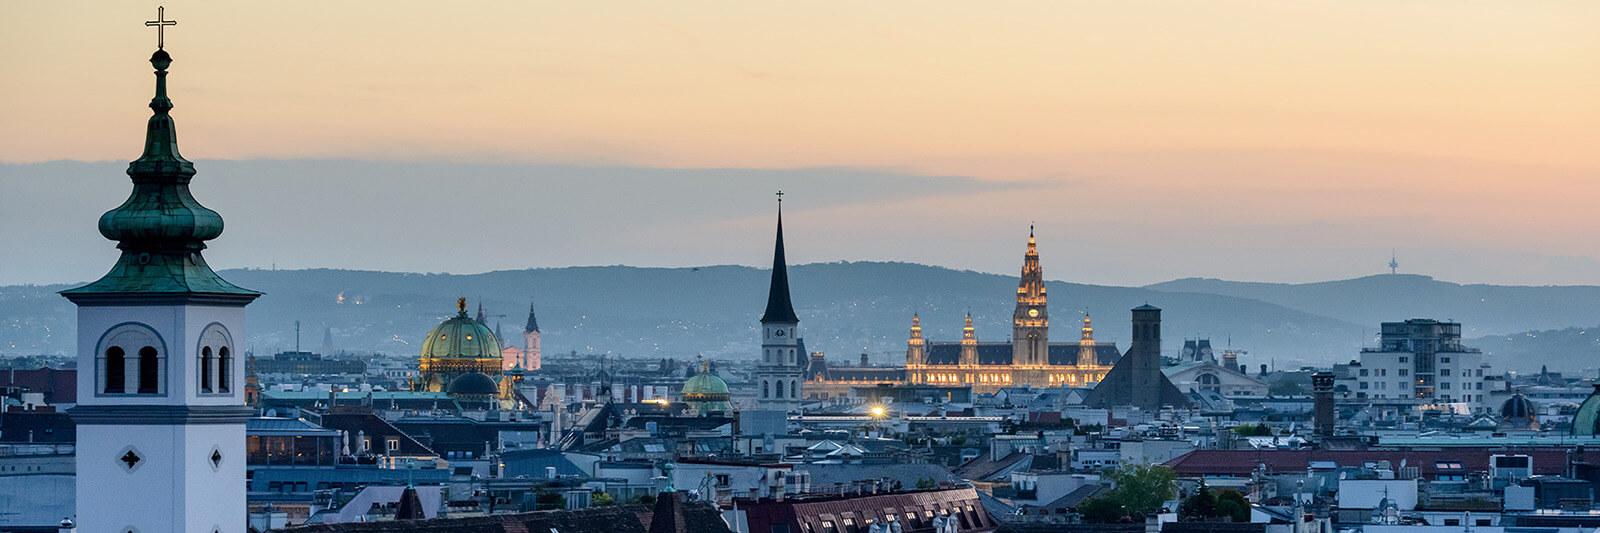 Vienna, Austria skyline